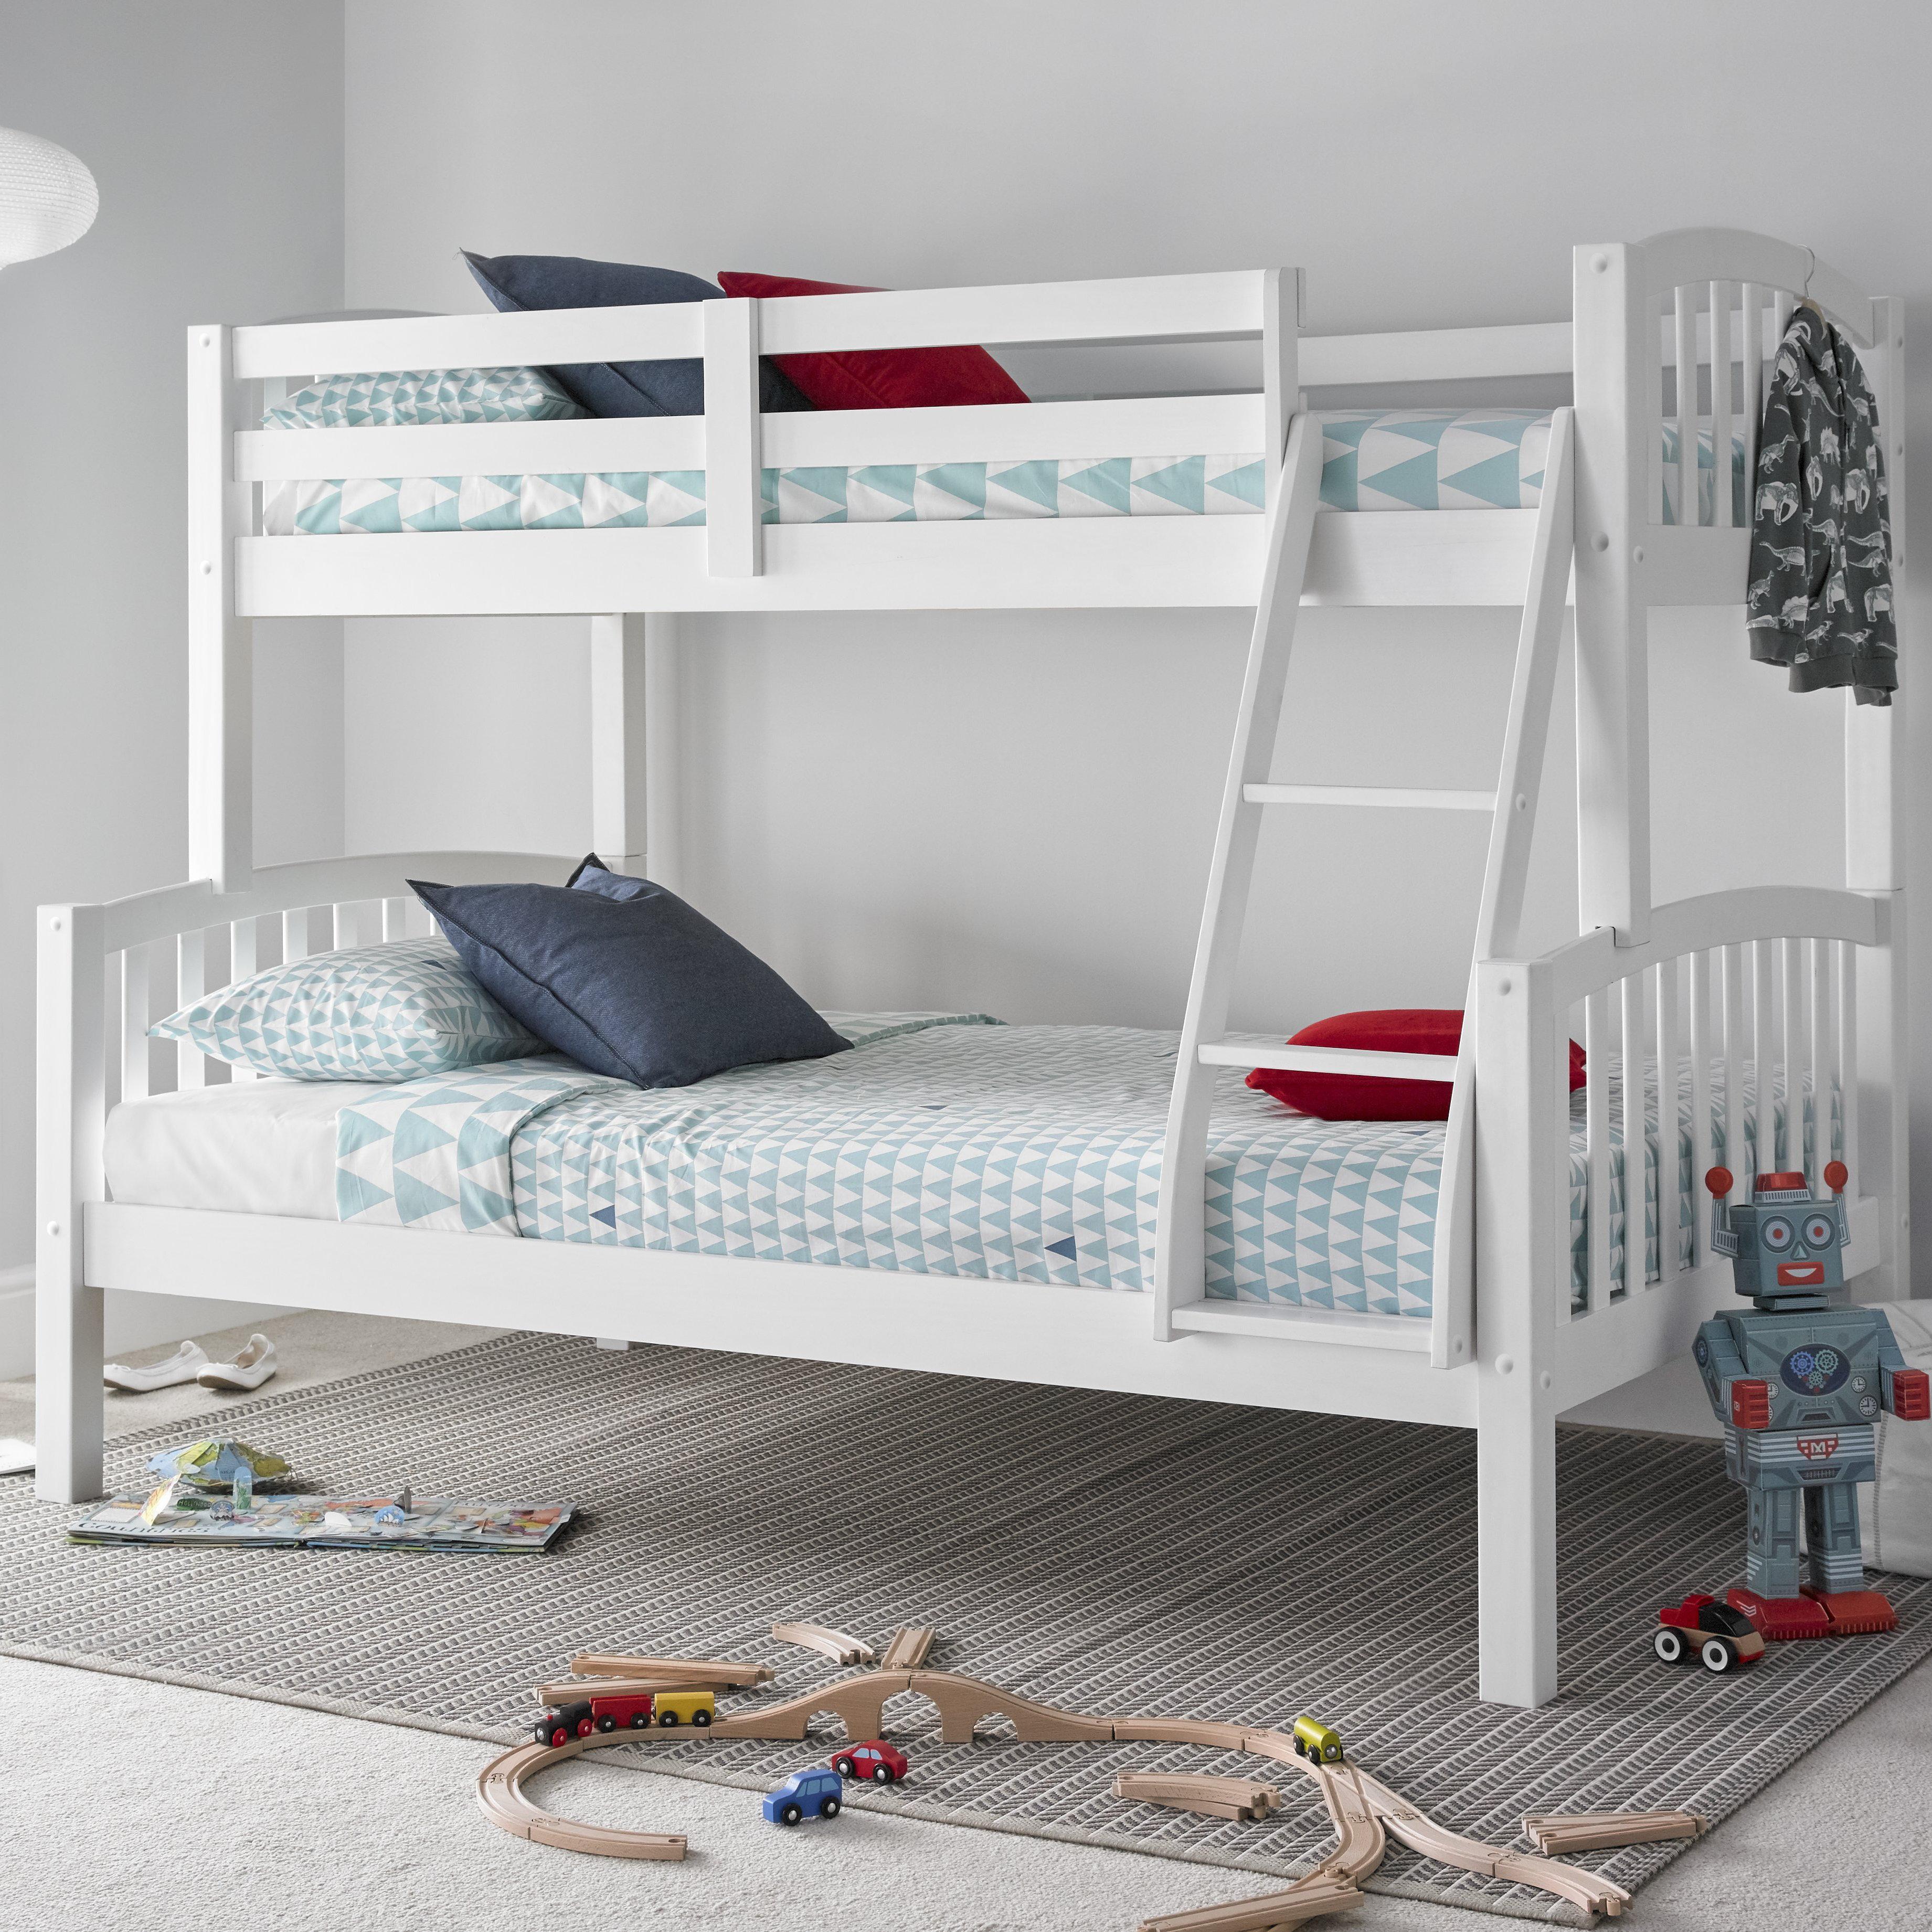 d2aa4deb759a Harriet Bee Aaliyah Bunk Bed with Mattresses & Reviews   Wayfair.co.uk